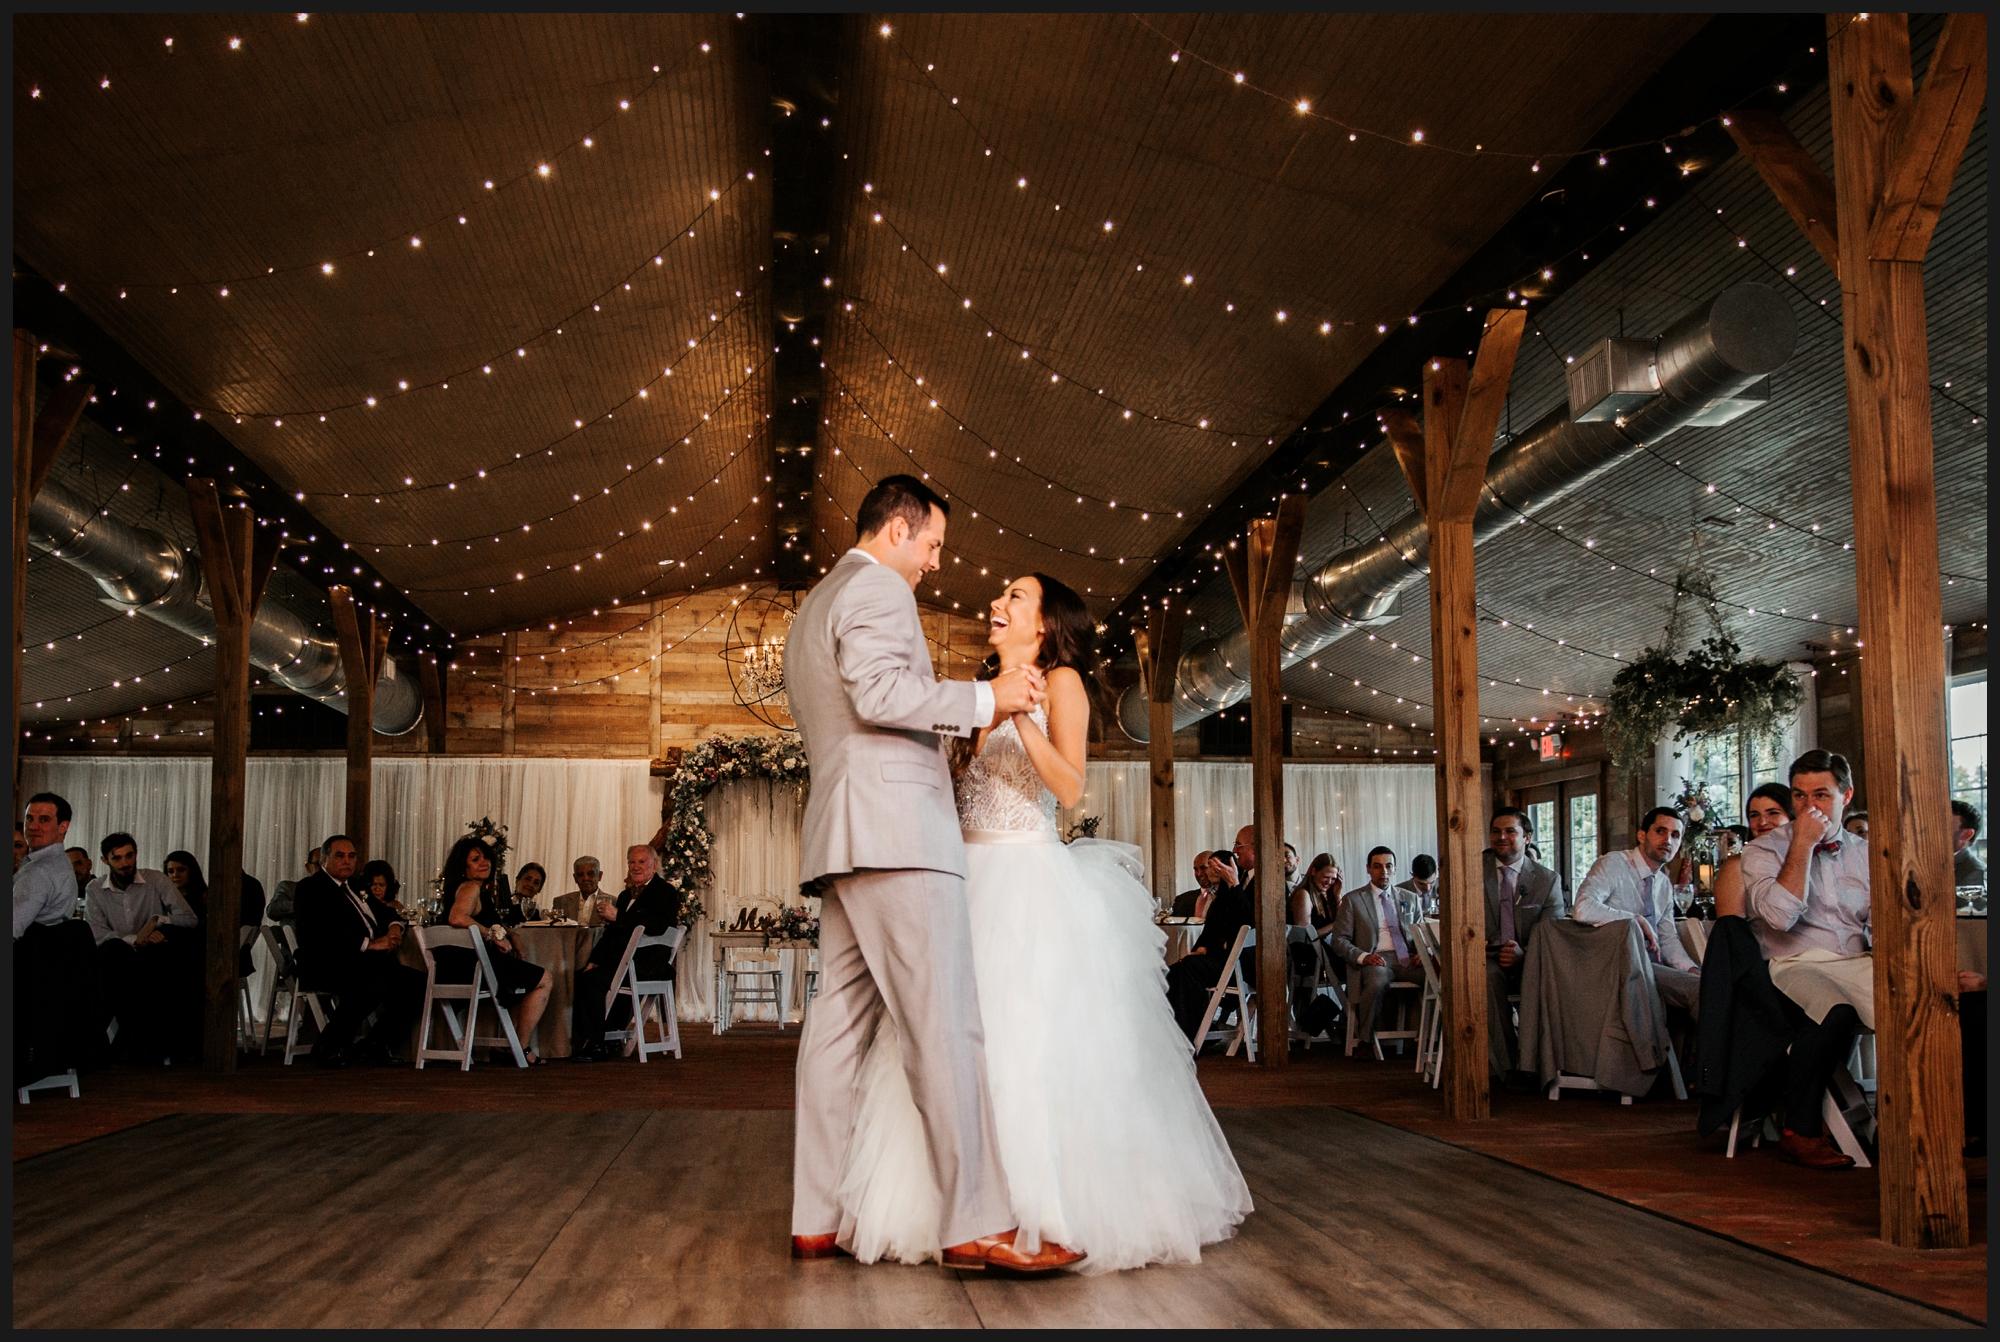 Orlando-Wedding-Photographer-destination-wedding-photographer-florida-wedding-photographer-bohemian-wedding-photographer_1637.jpg